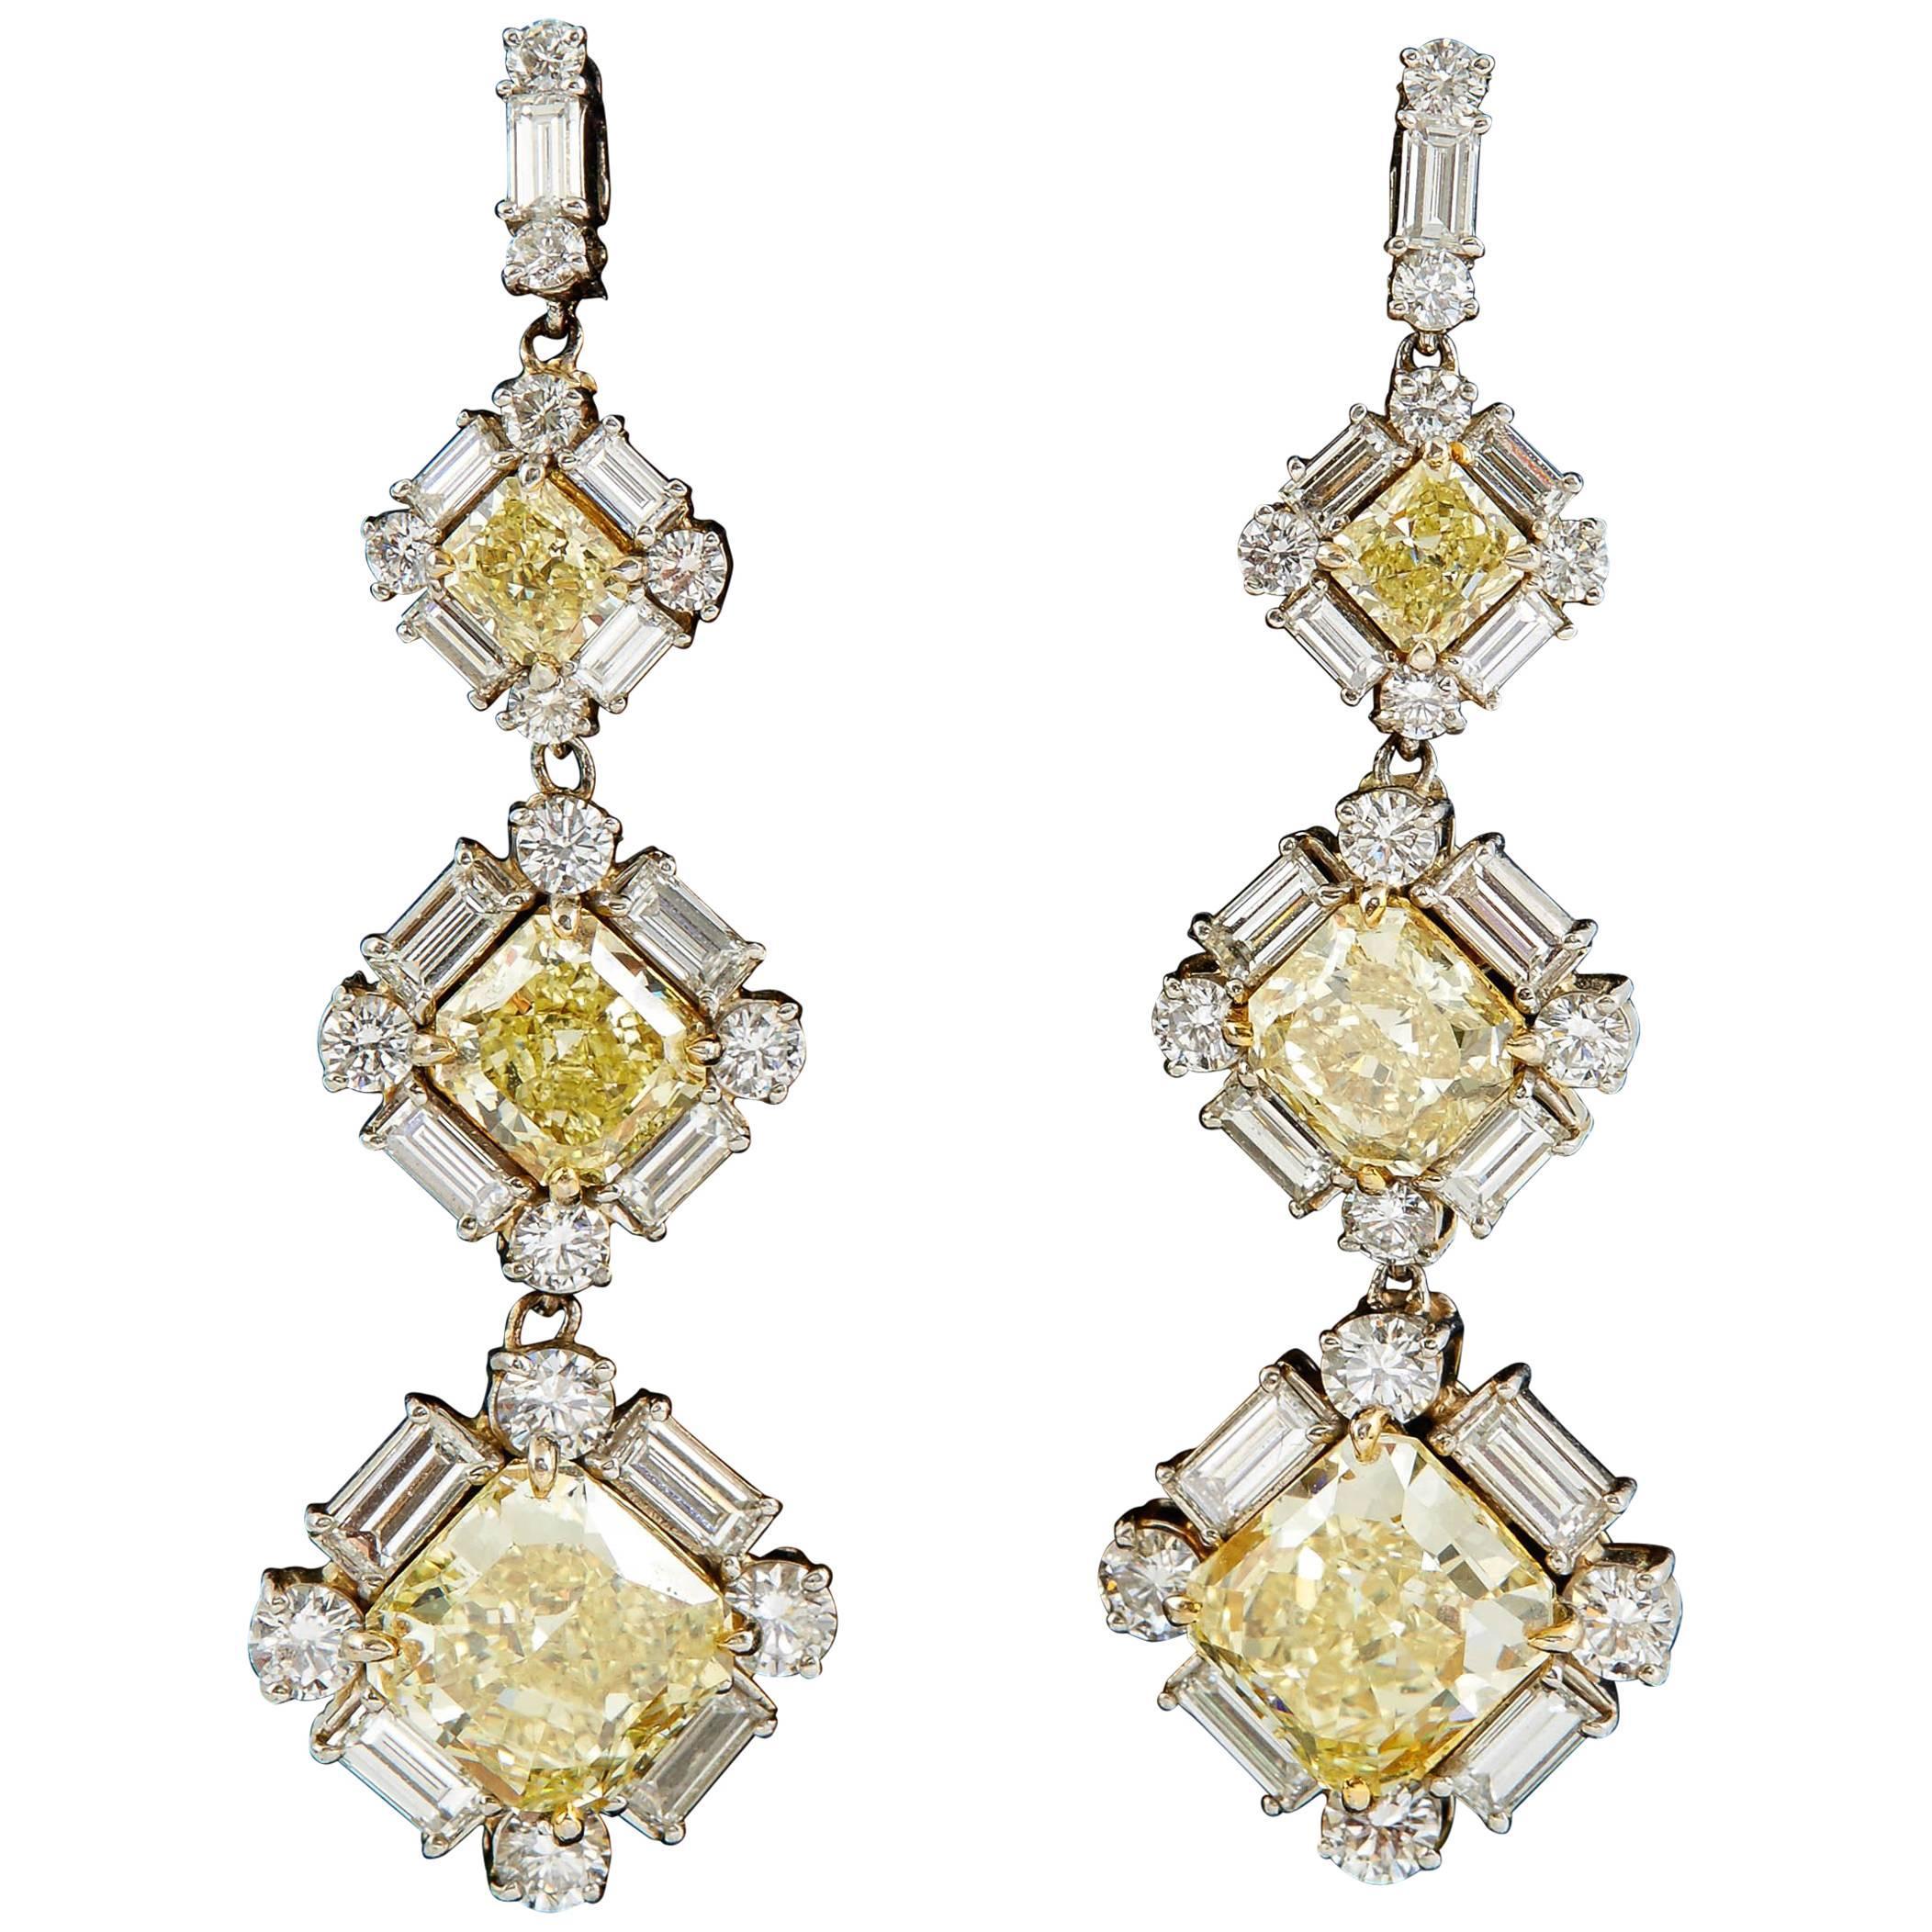 GIA Certified Natural Fancy Yellow and White Diamonds Drop Earrings